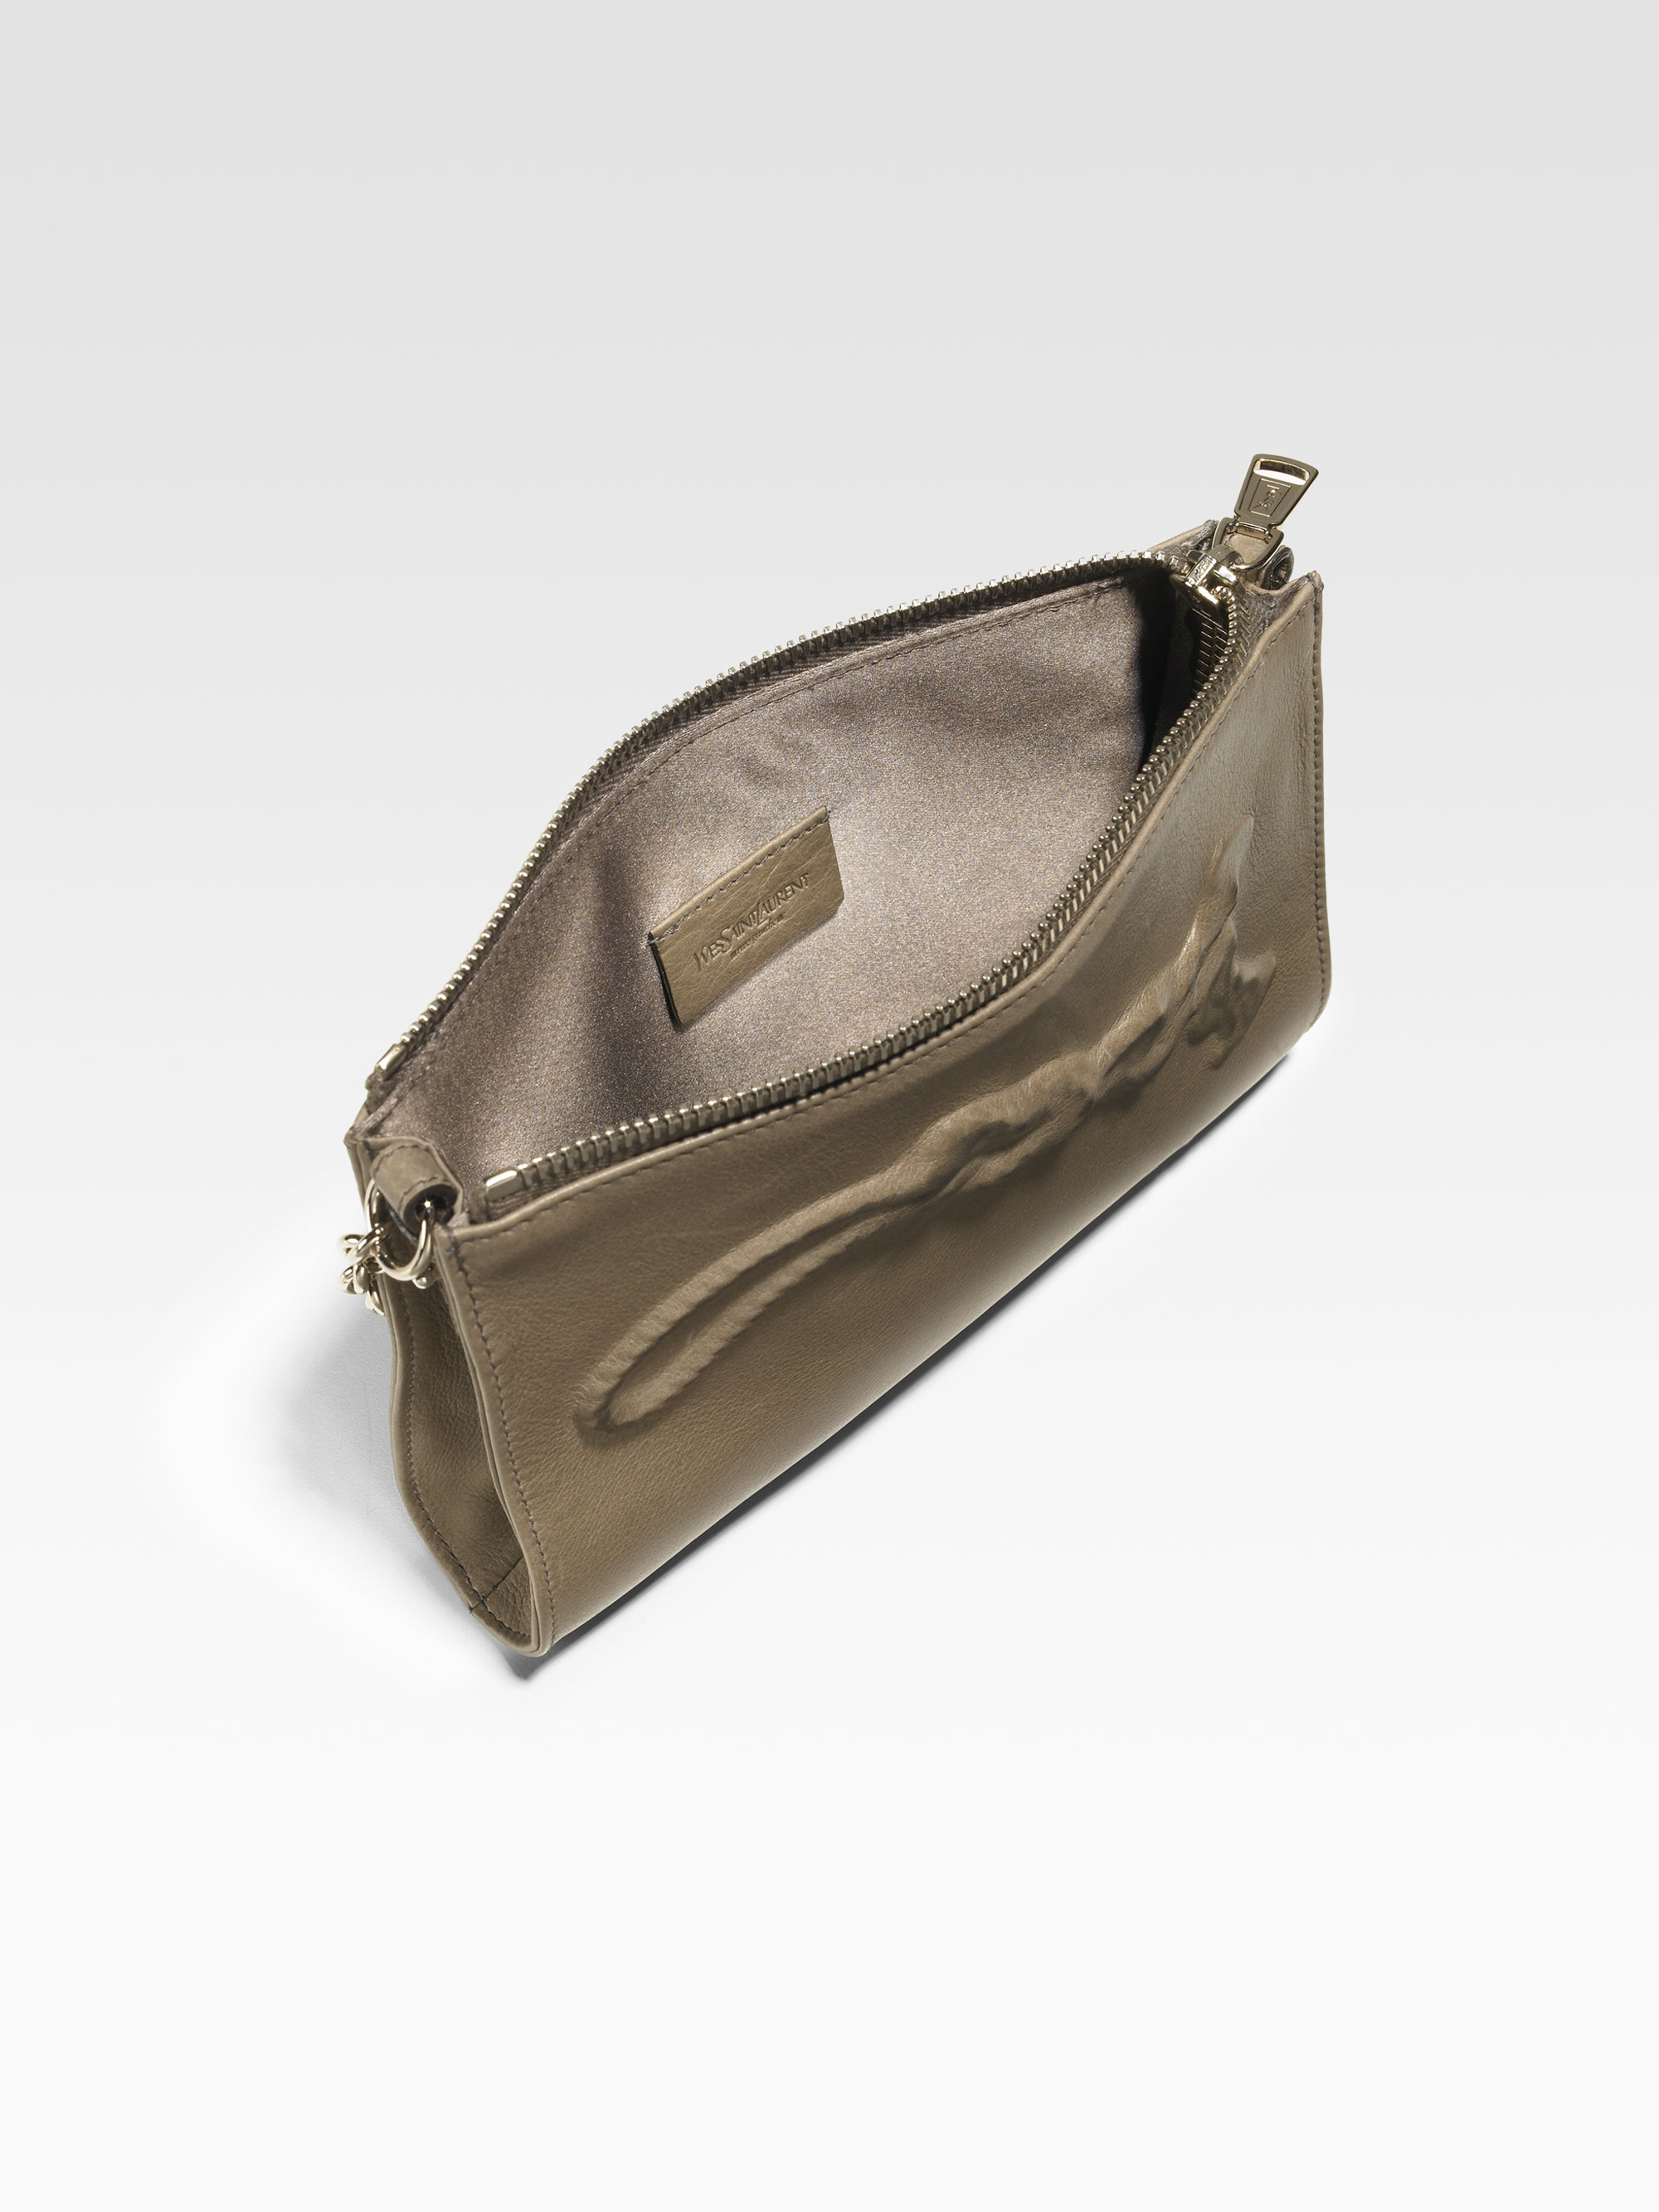 4991b2f31598 yves saint laurent look - Saint laurent Mini Charm Leather Bag in Gray  (grey)